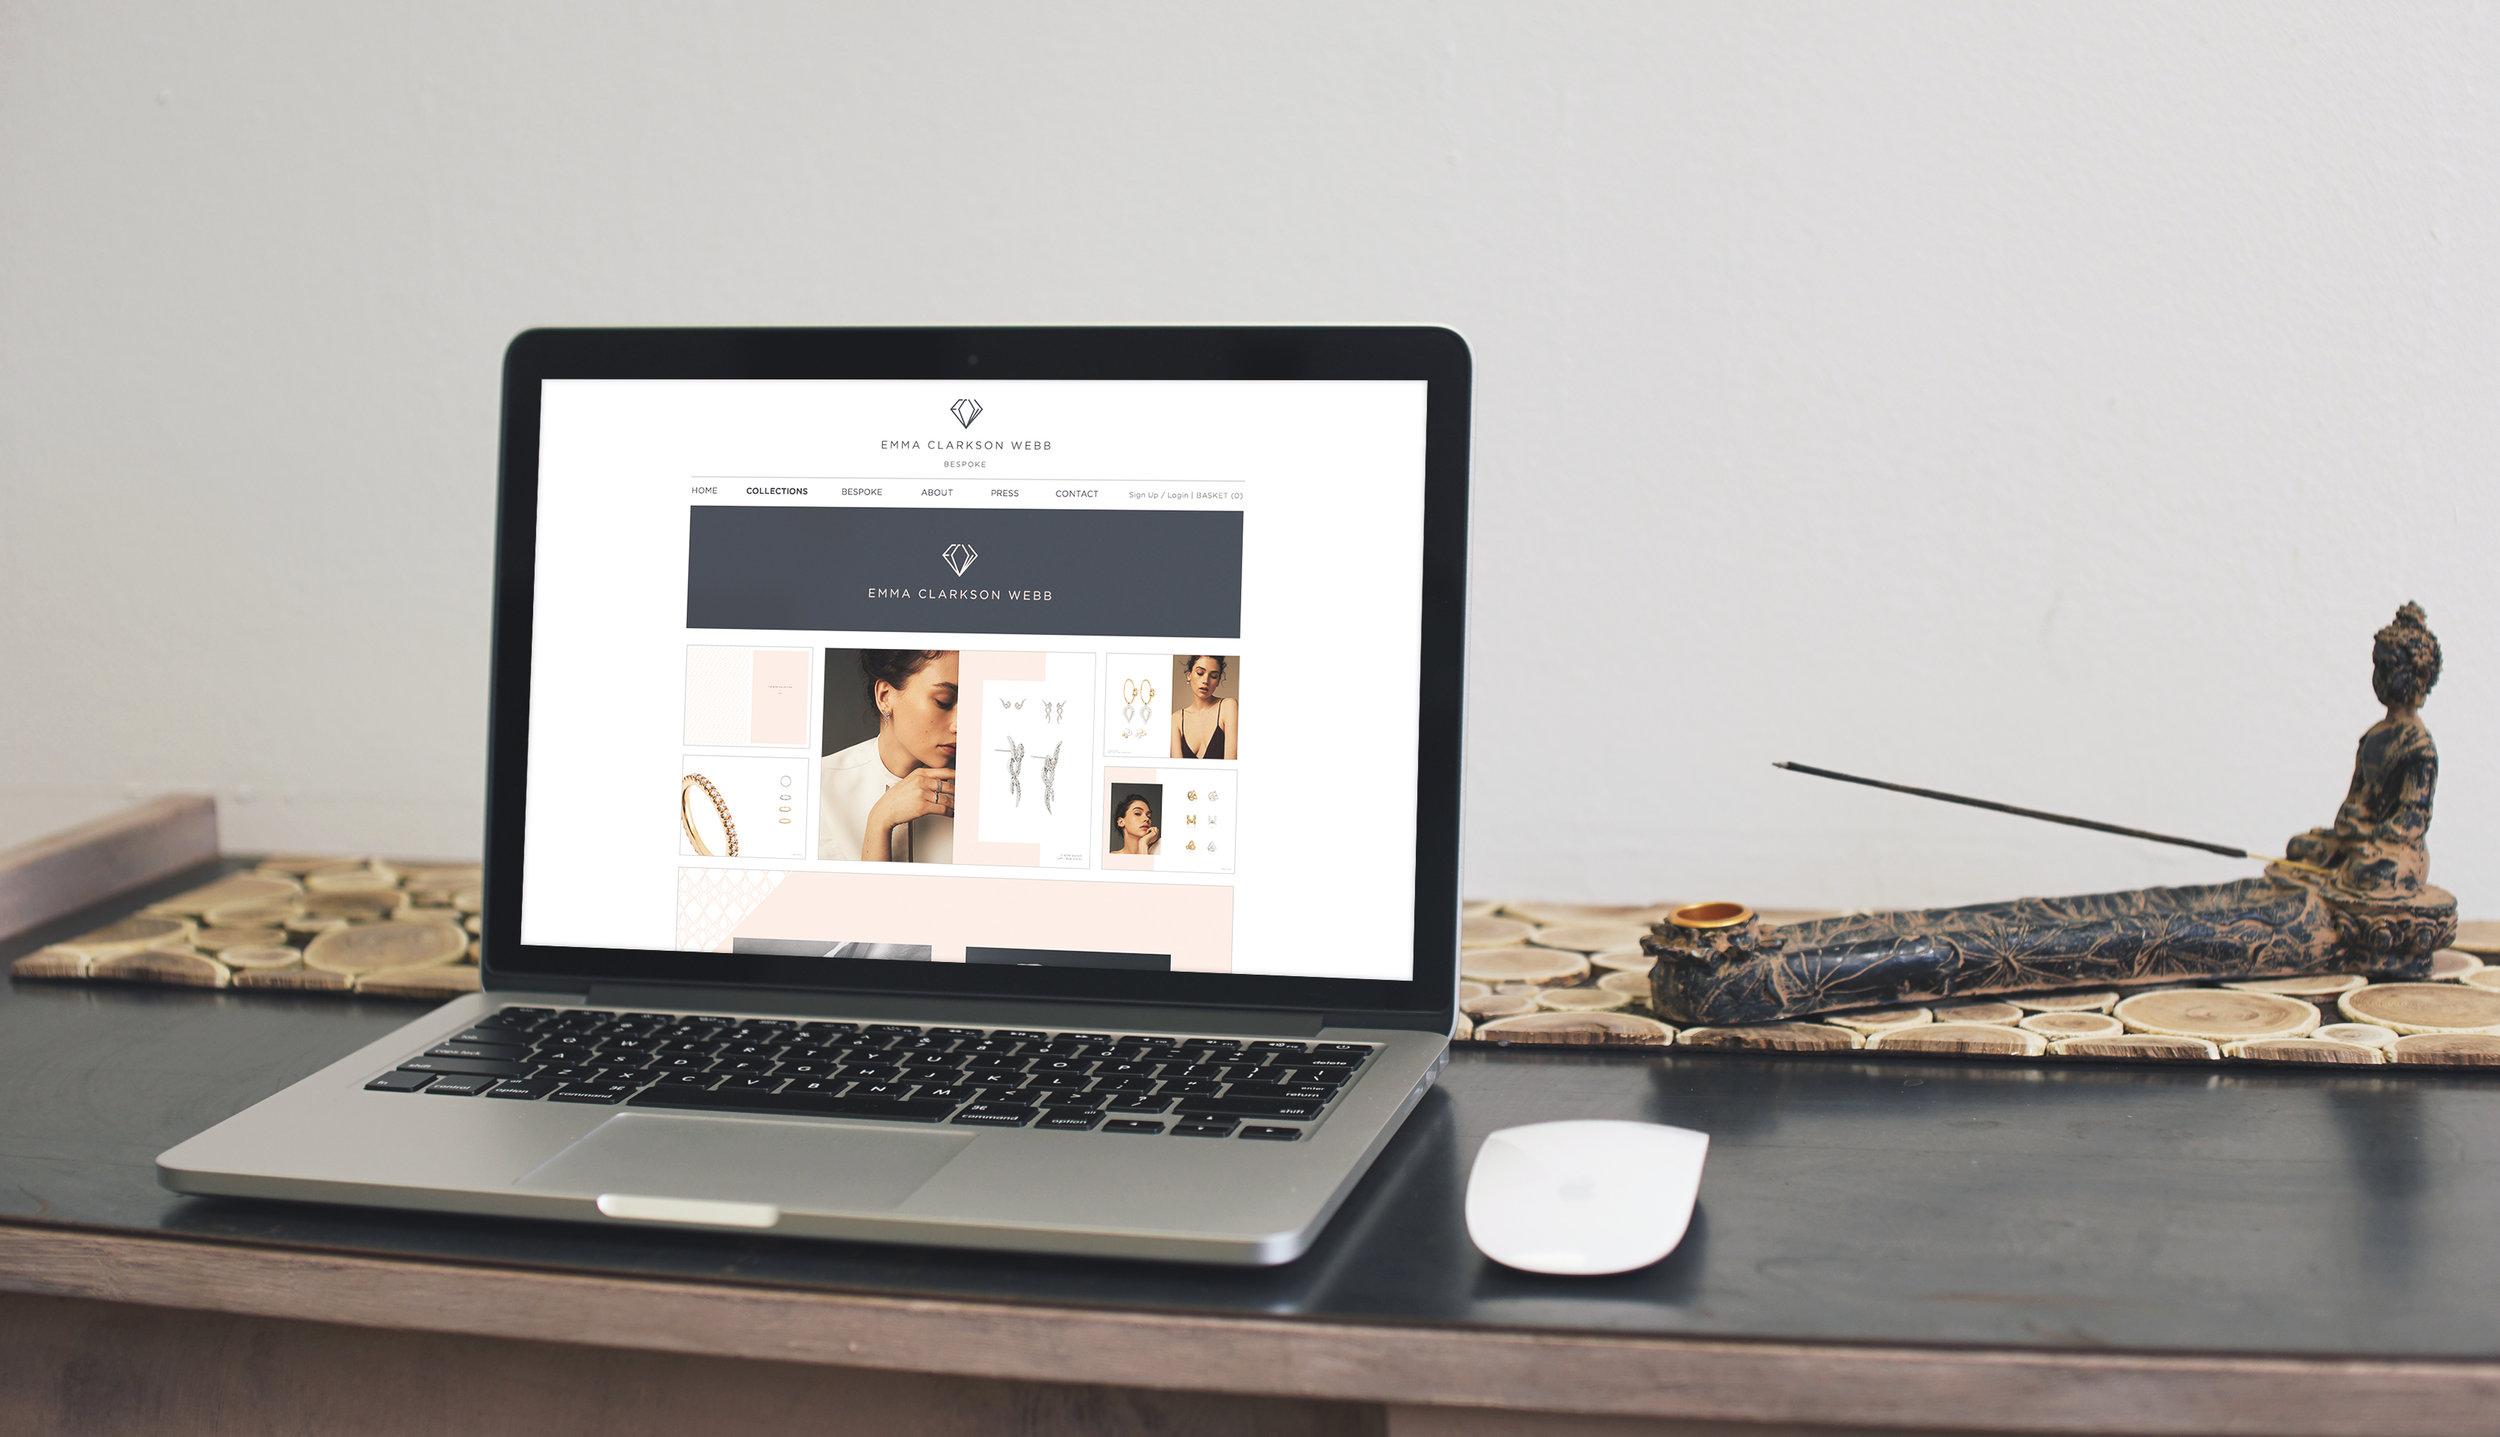 Bolter design website design for Emma Clarkson Webb